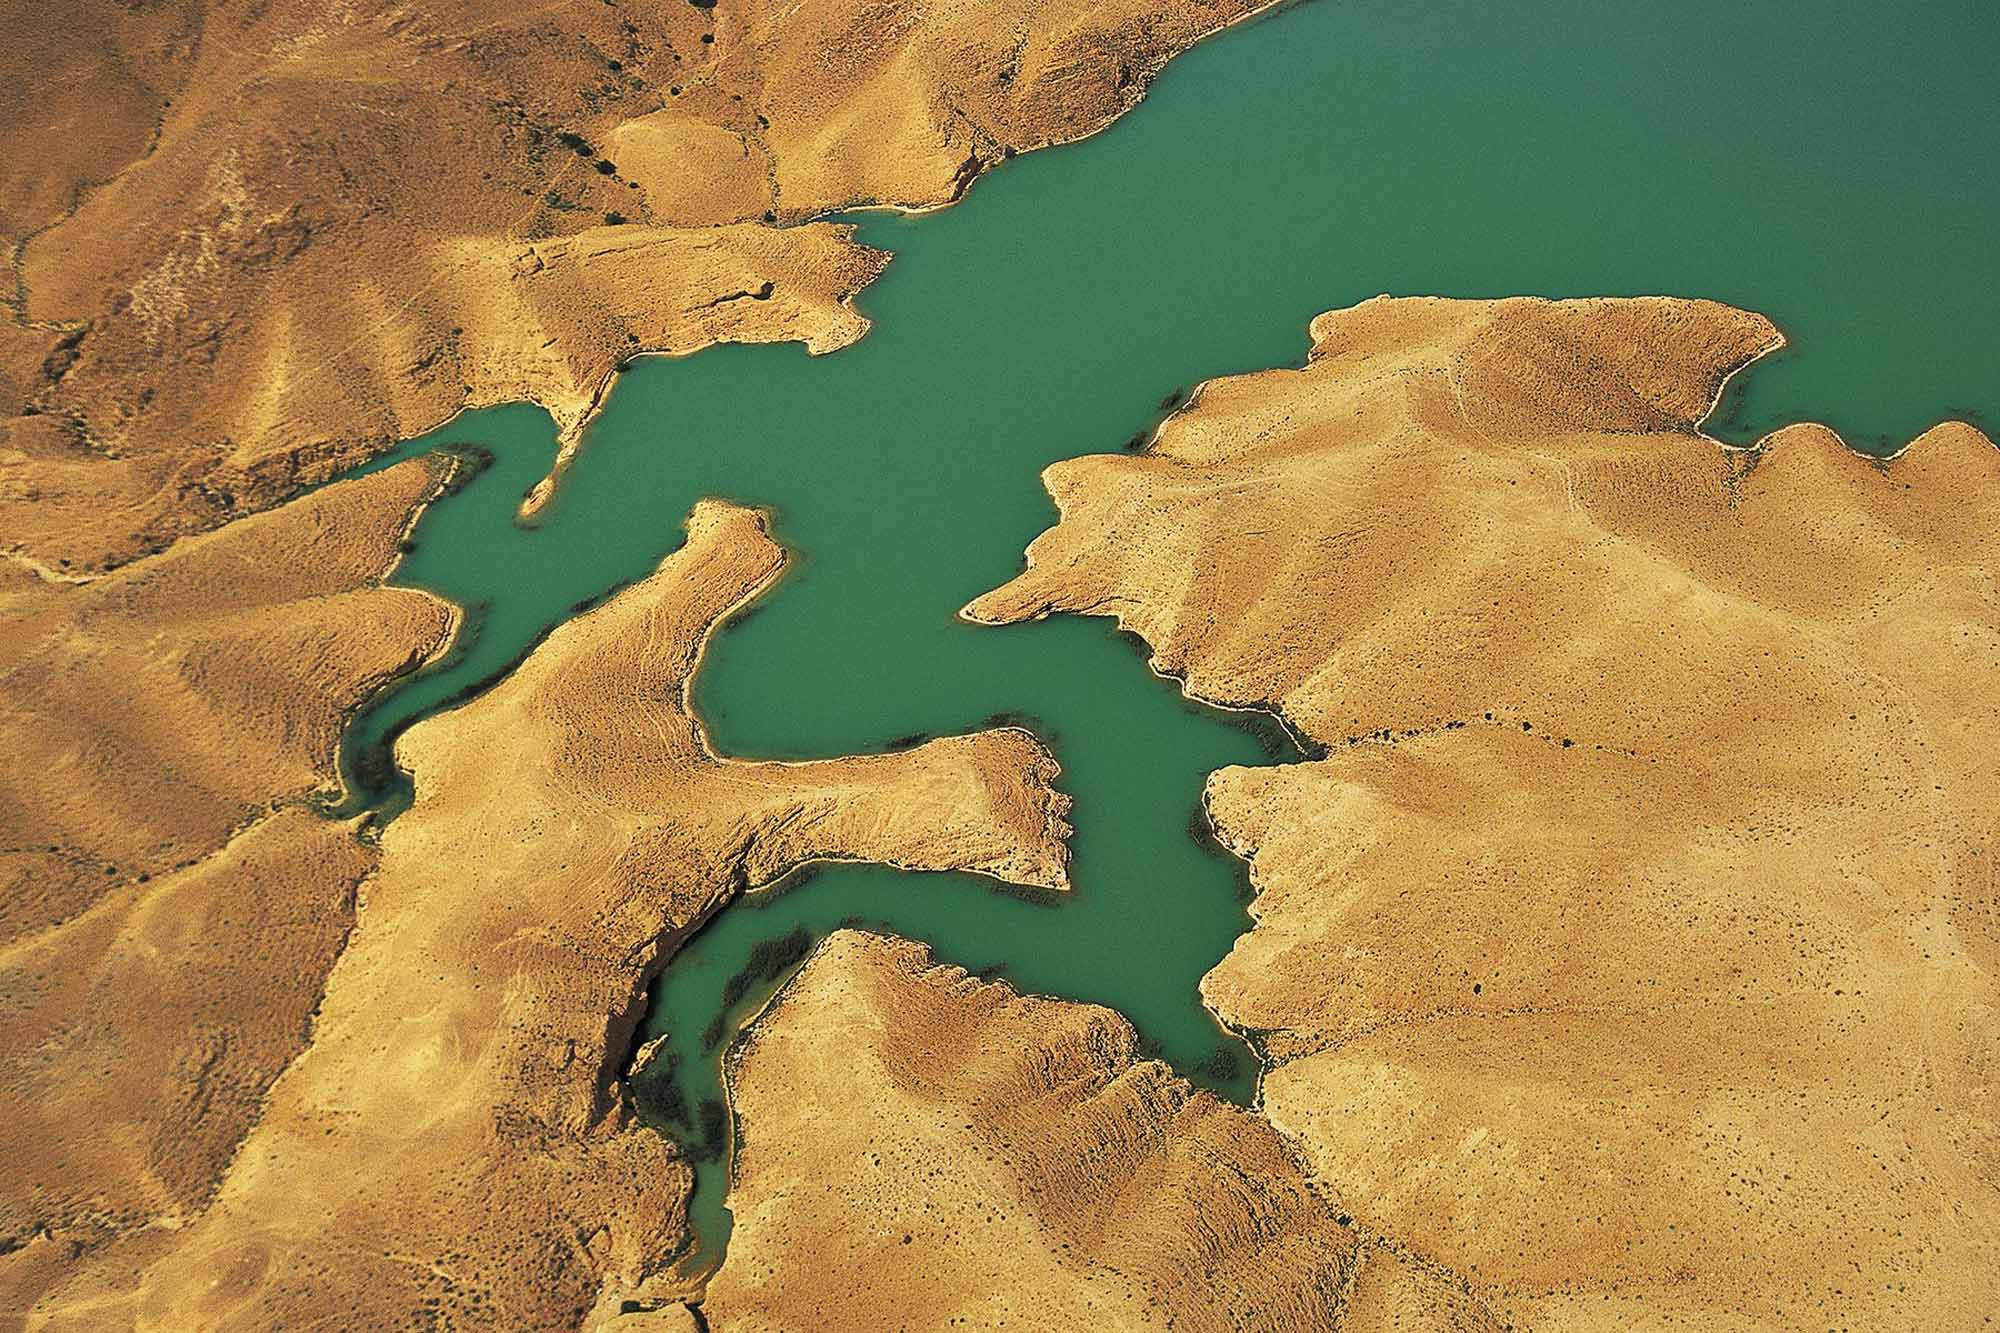 Canyon - Yann Arthus-Bertrand